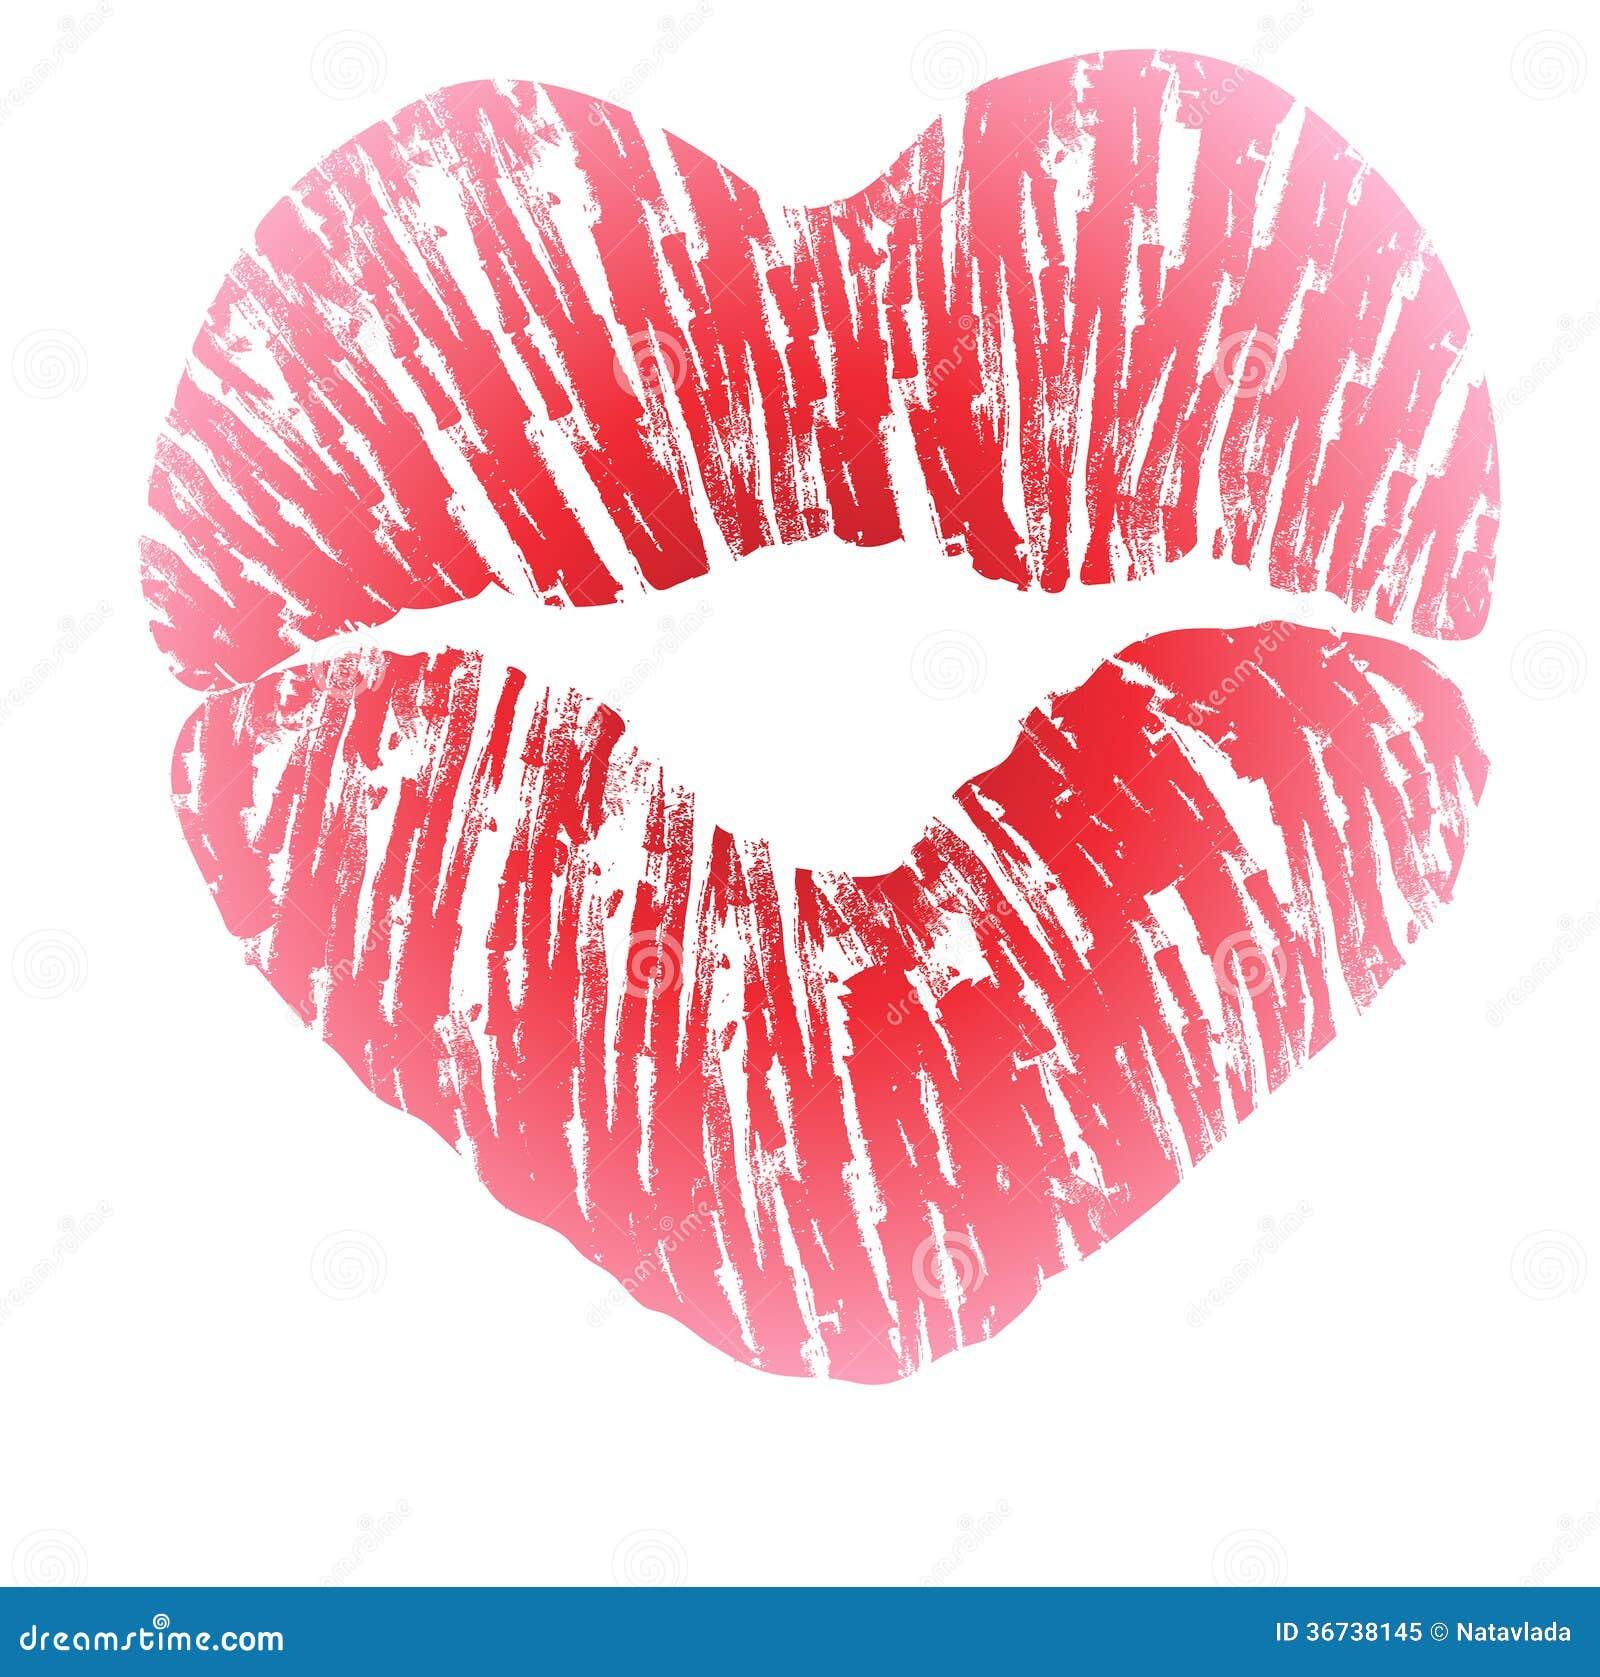 Imprint of heart shaped lips